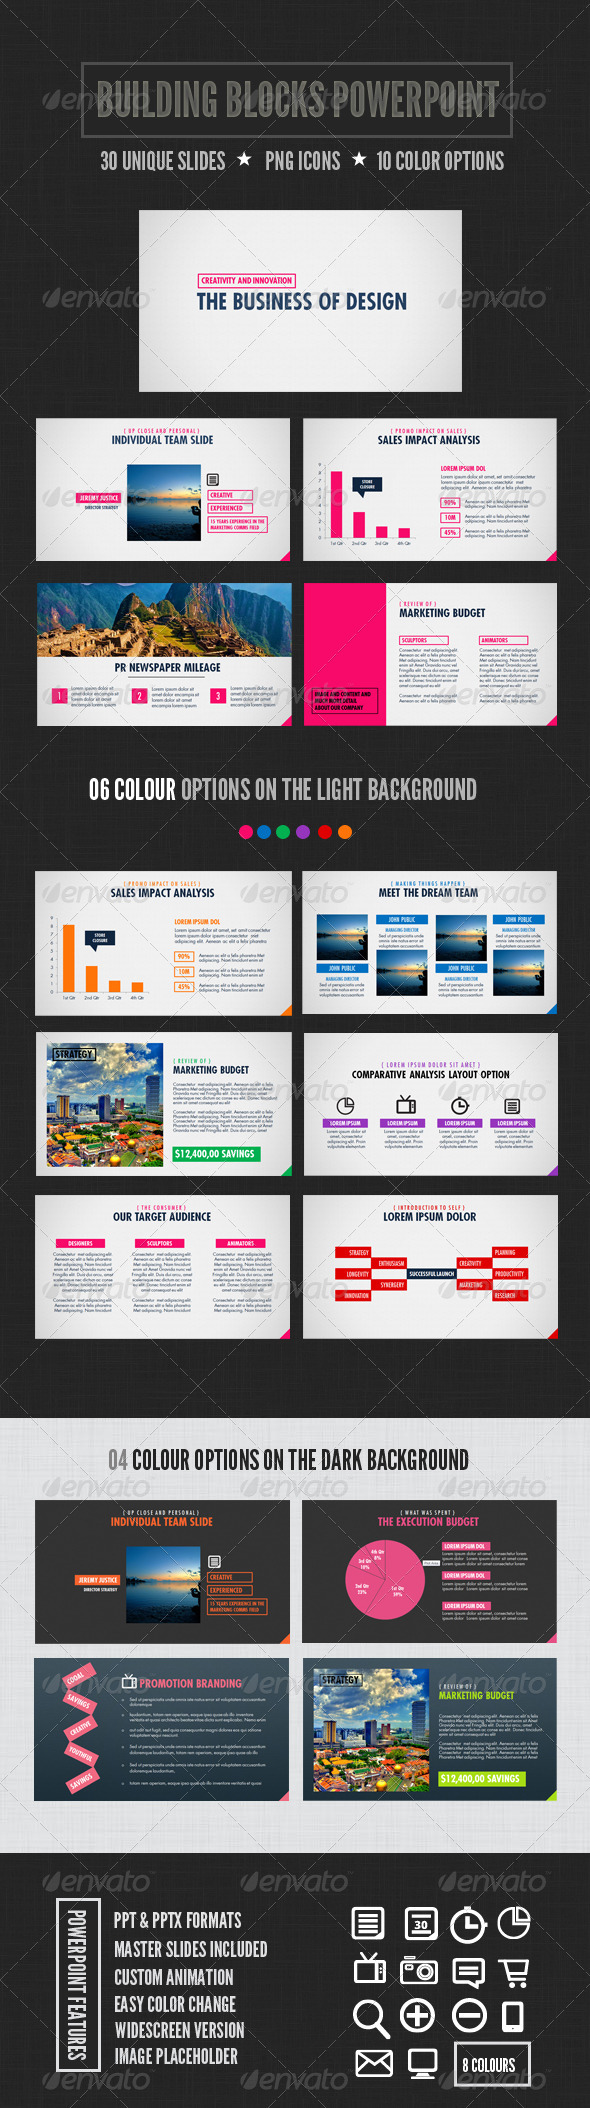 GraphicRiver Building Blocks Powerpoint 3336558